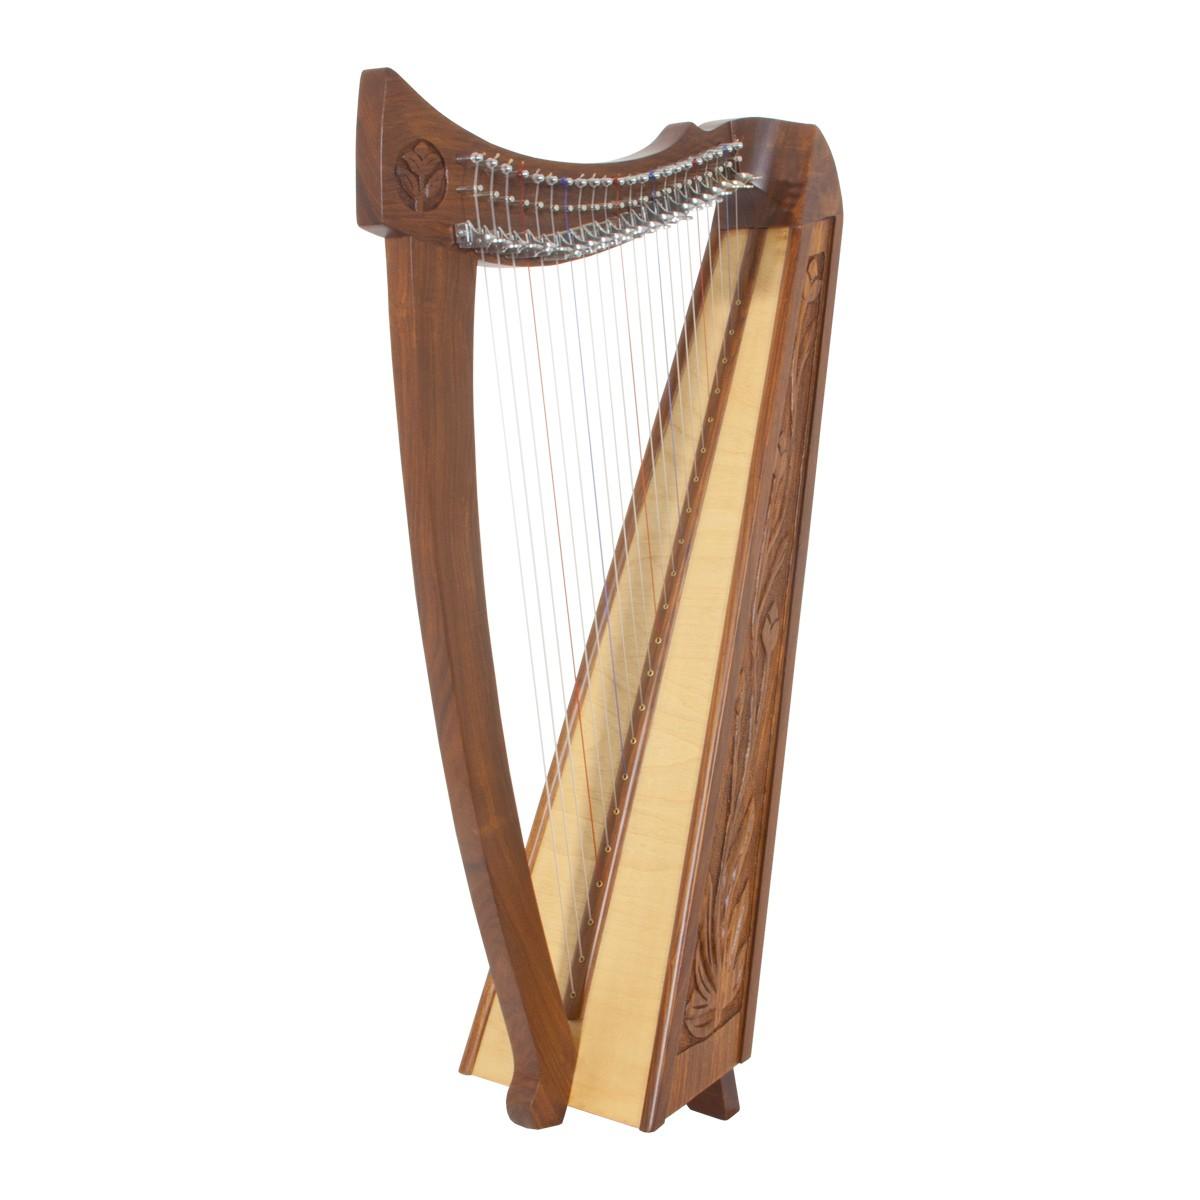 Roosebeck Balladeer Harp 22-String Zachary Taylor